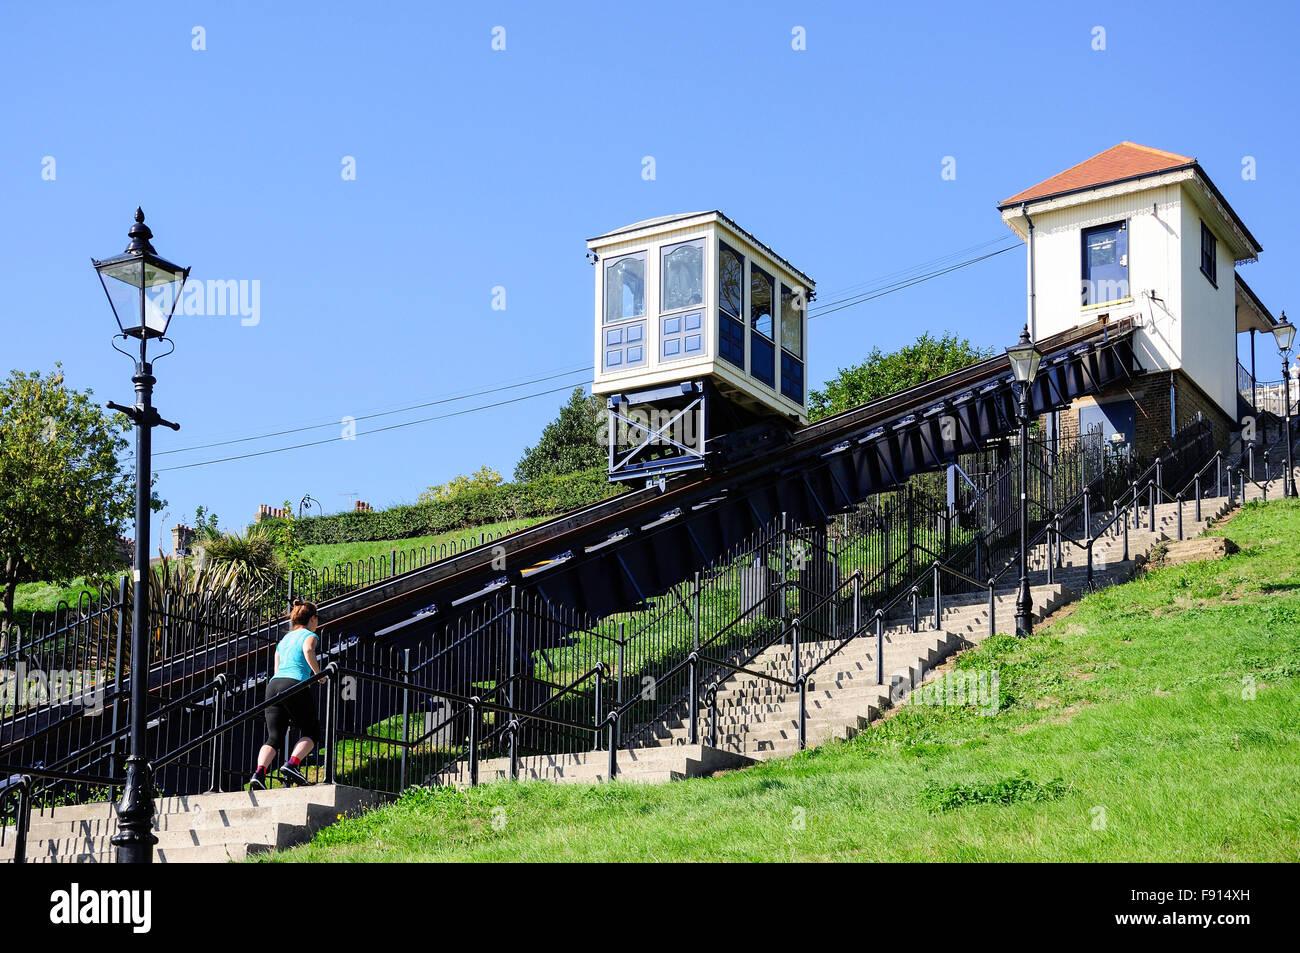 Historic Southend Cliff Railway, Western Esplanade, Southend-On-Sea, Essex, England, United Kingdom - Stock Image